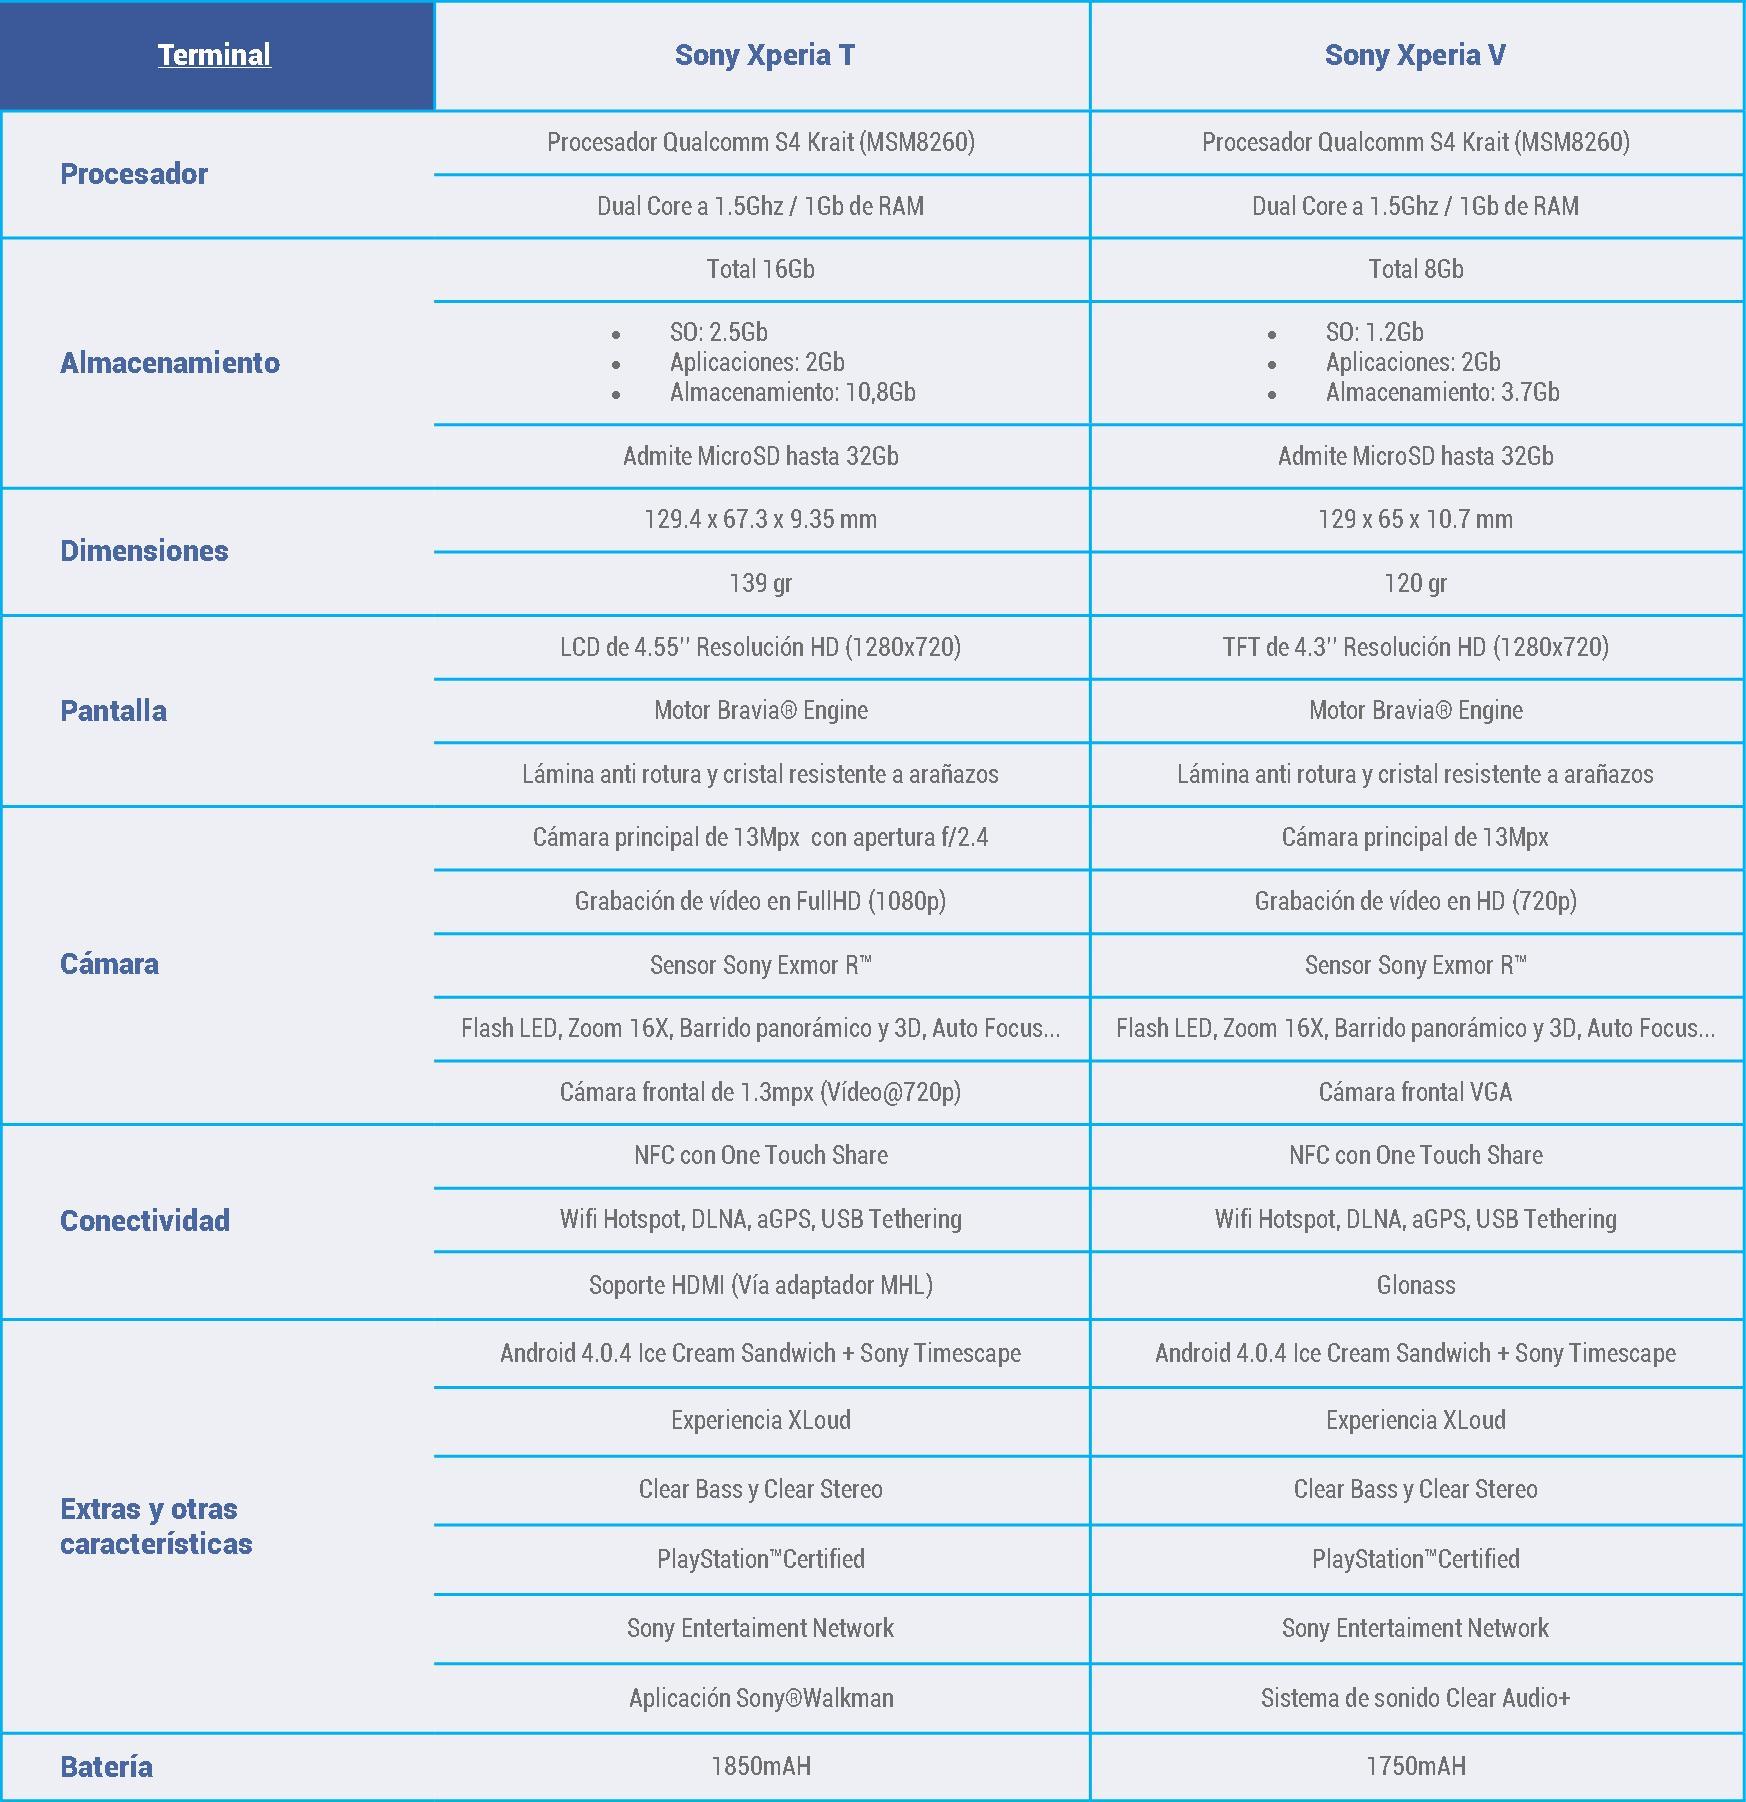 Caracteristicas-Sony-Xperia-V-Sony-Xperia-T